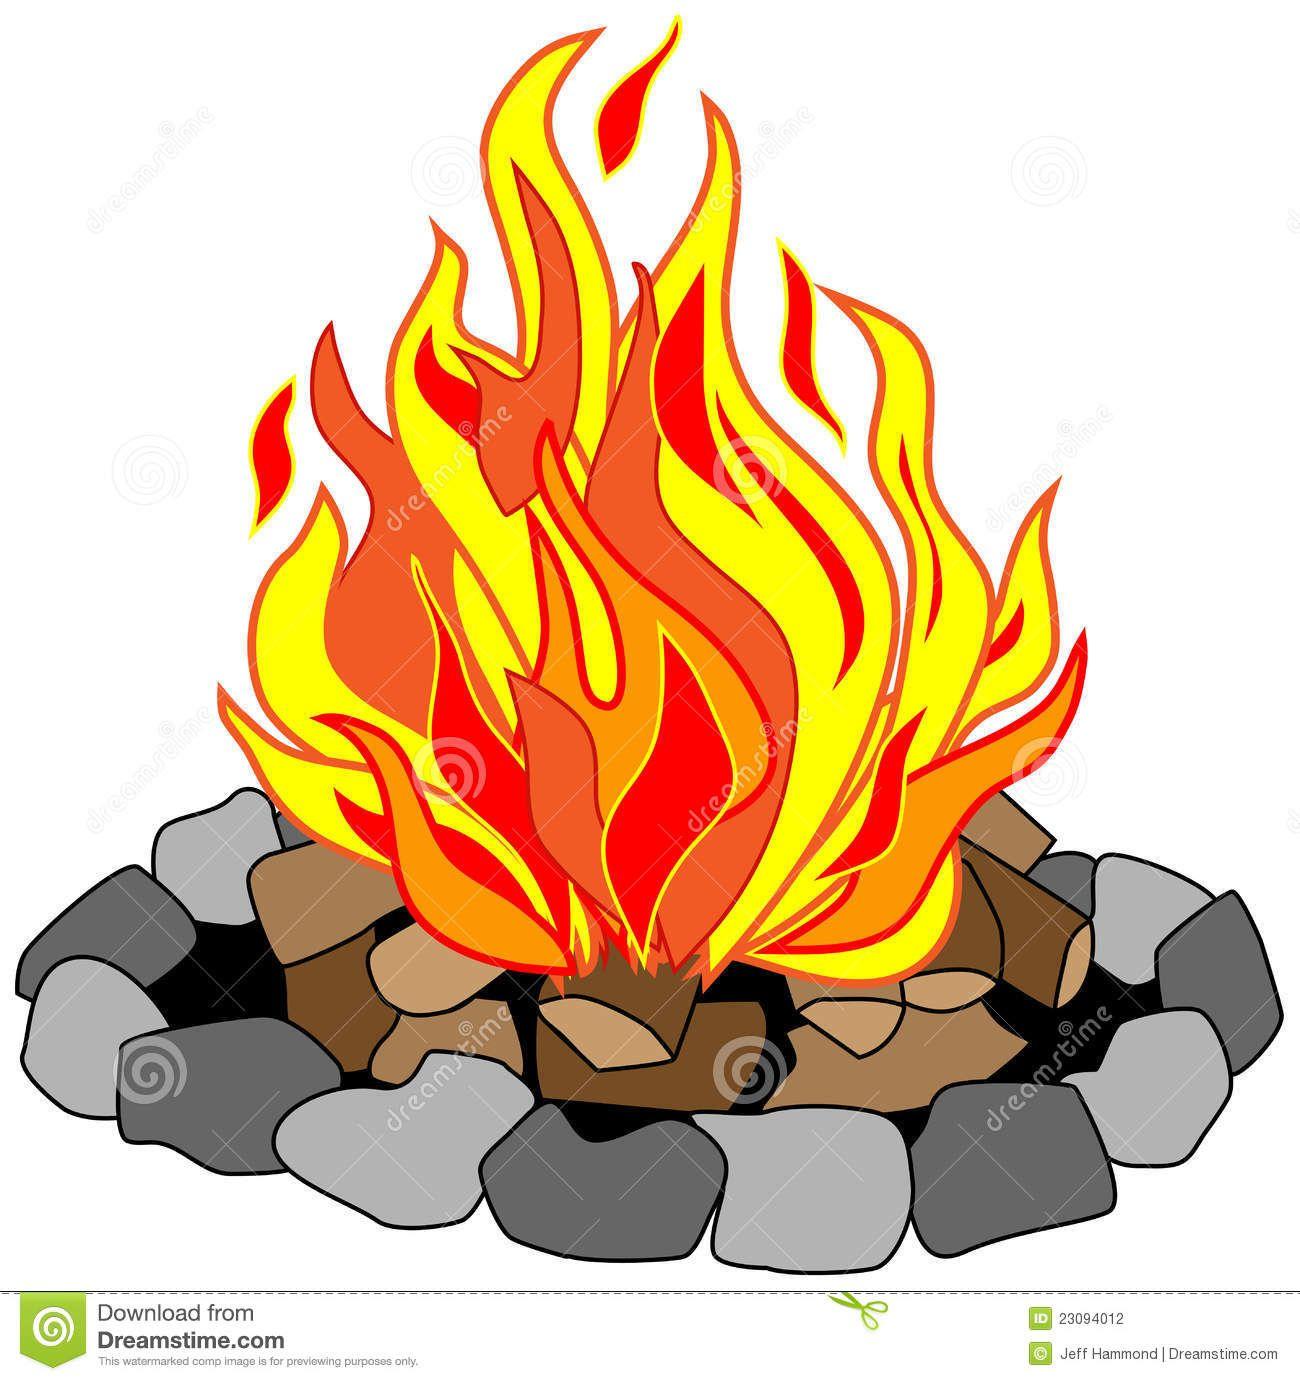 Clip art free vector. Campfire clipart fire pit